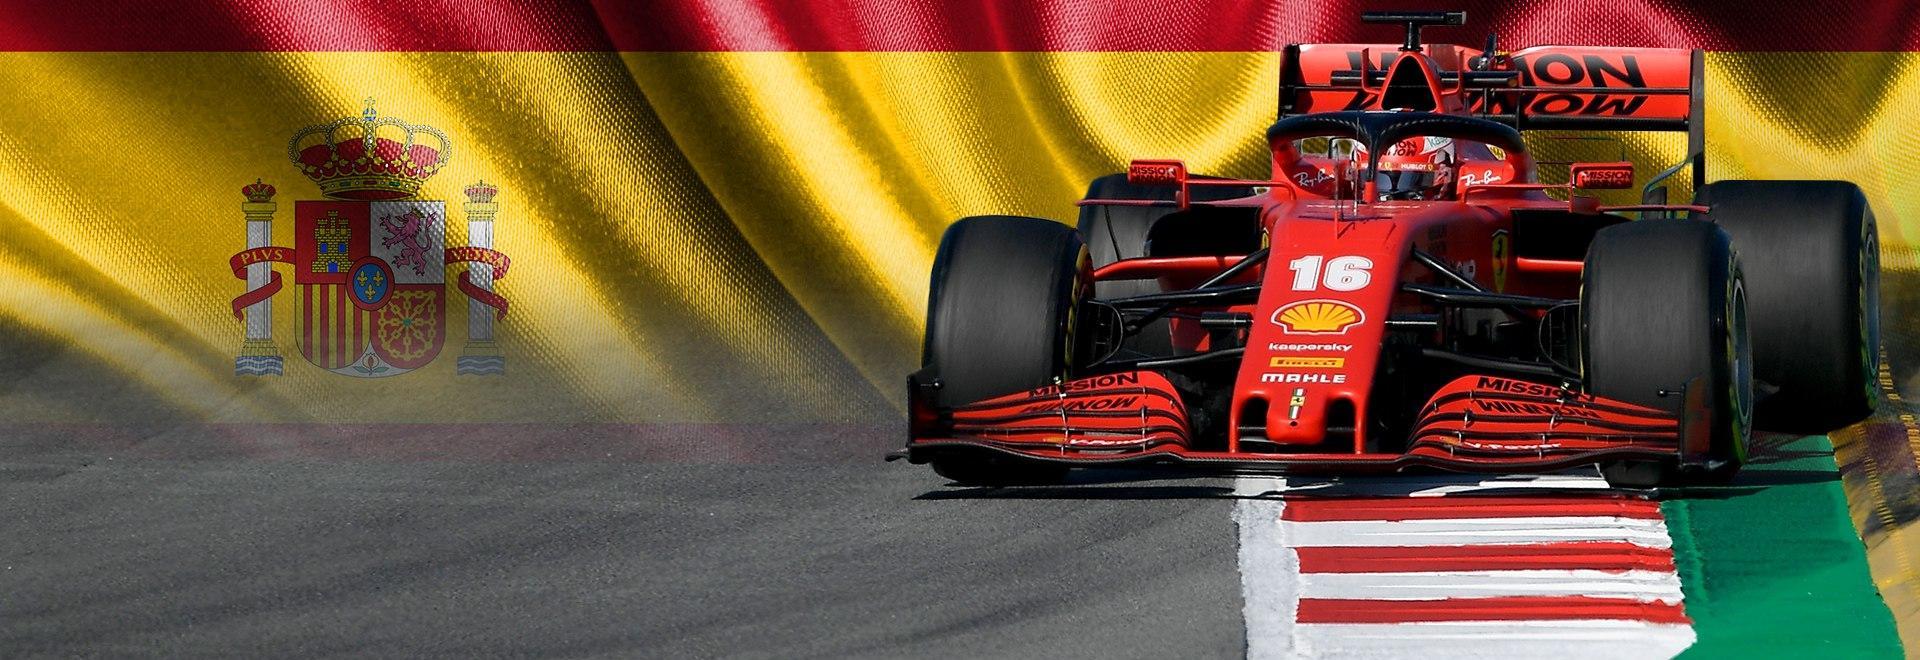 GP Spagna. PL1